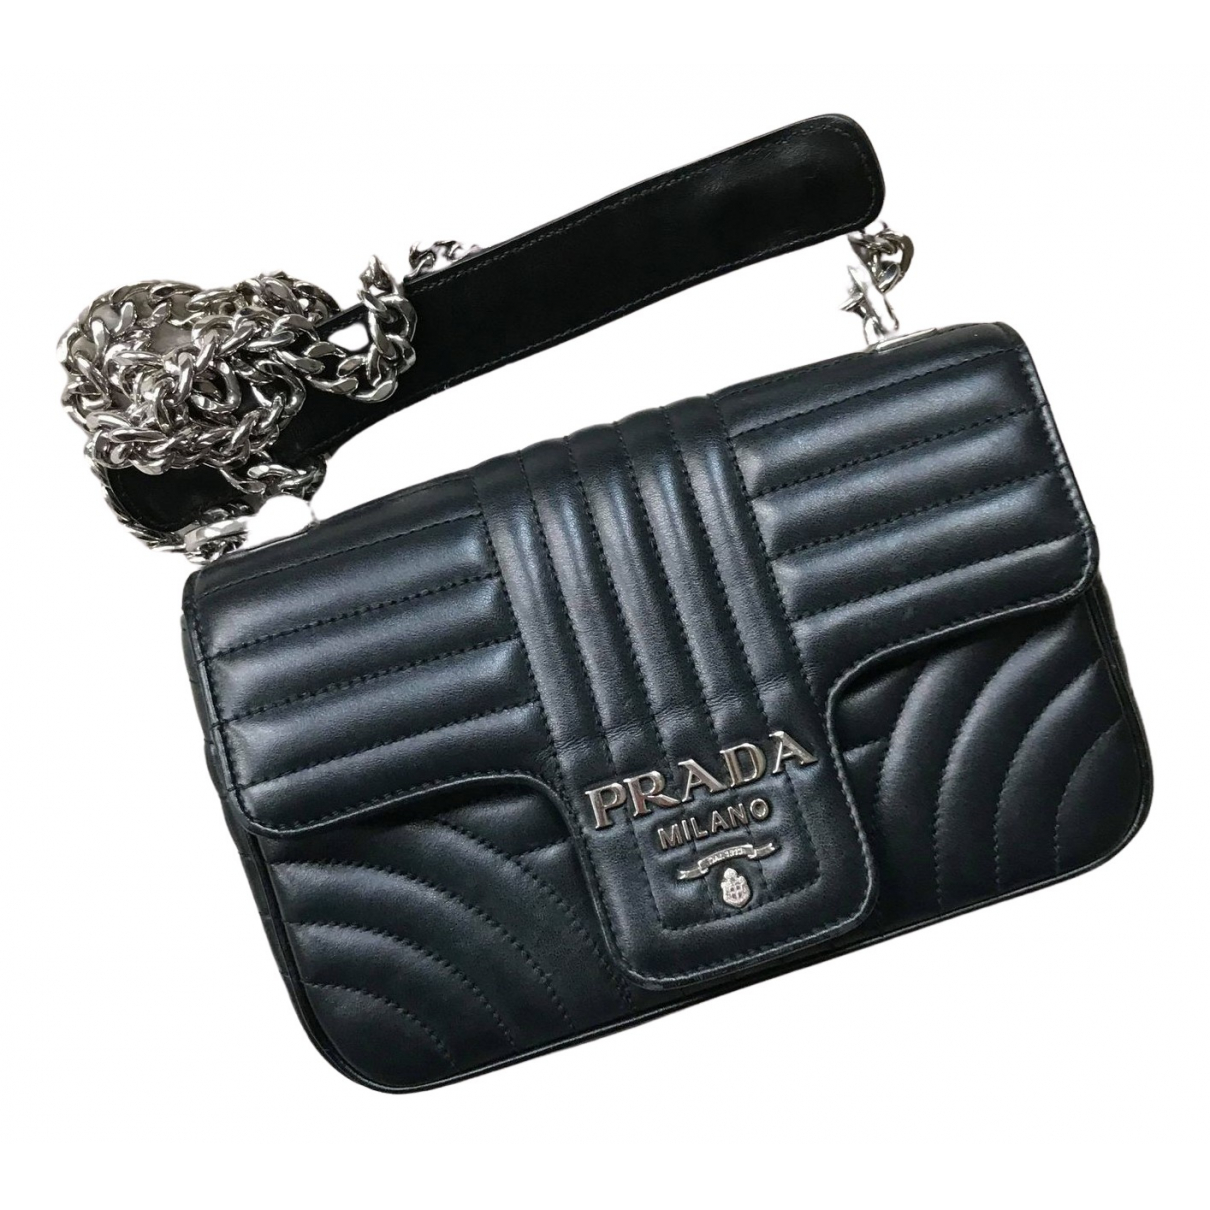 Prada Diagramme Black Leather handbag for Women N